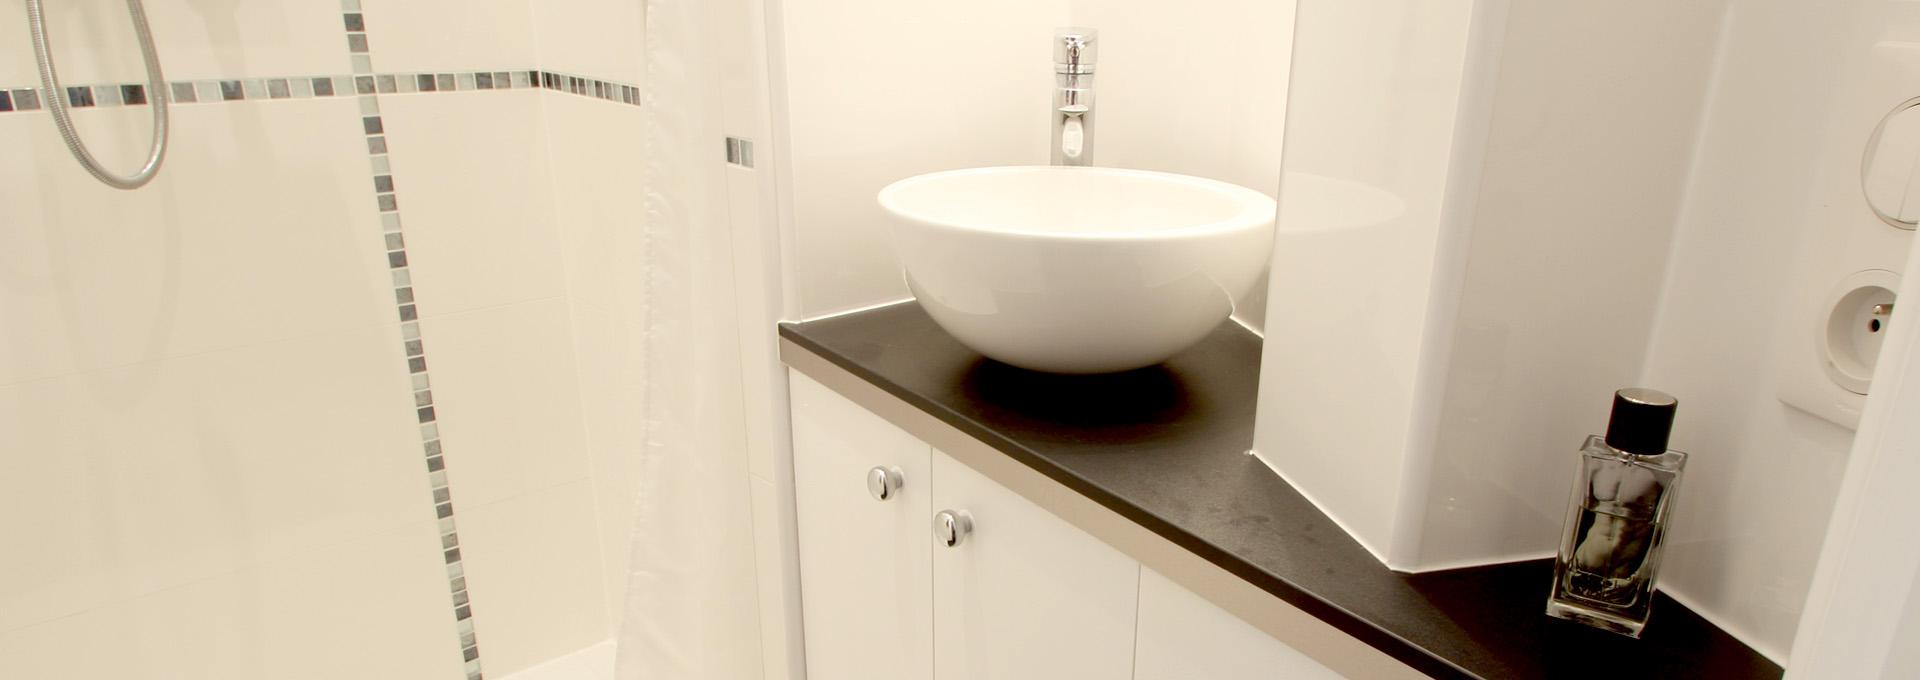 salle de bain optimise studio architecte agence avous